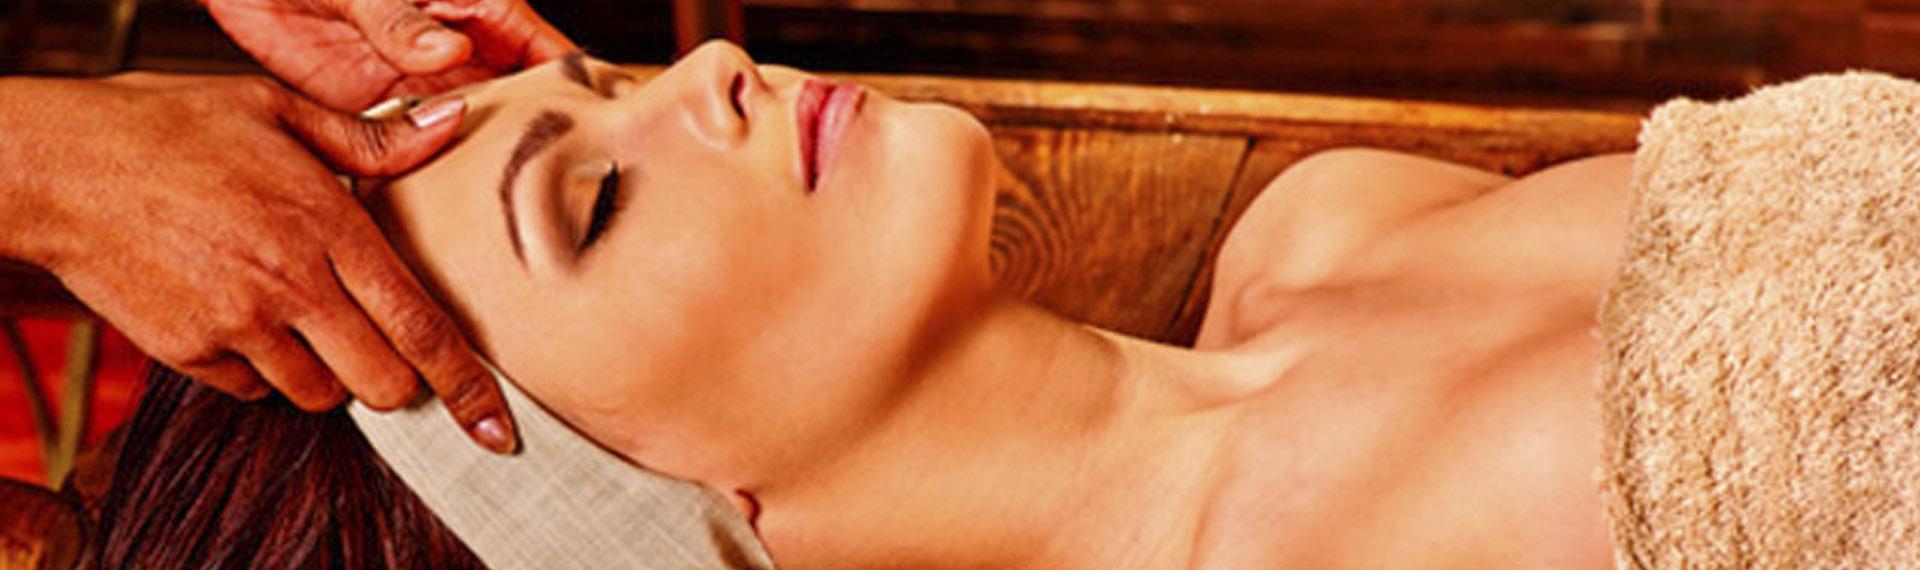 masaje ayurvédico - terapias alternativas alcobendas